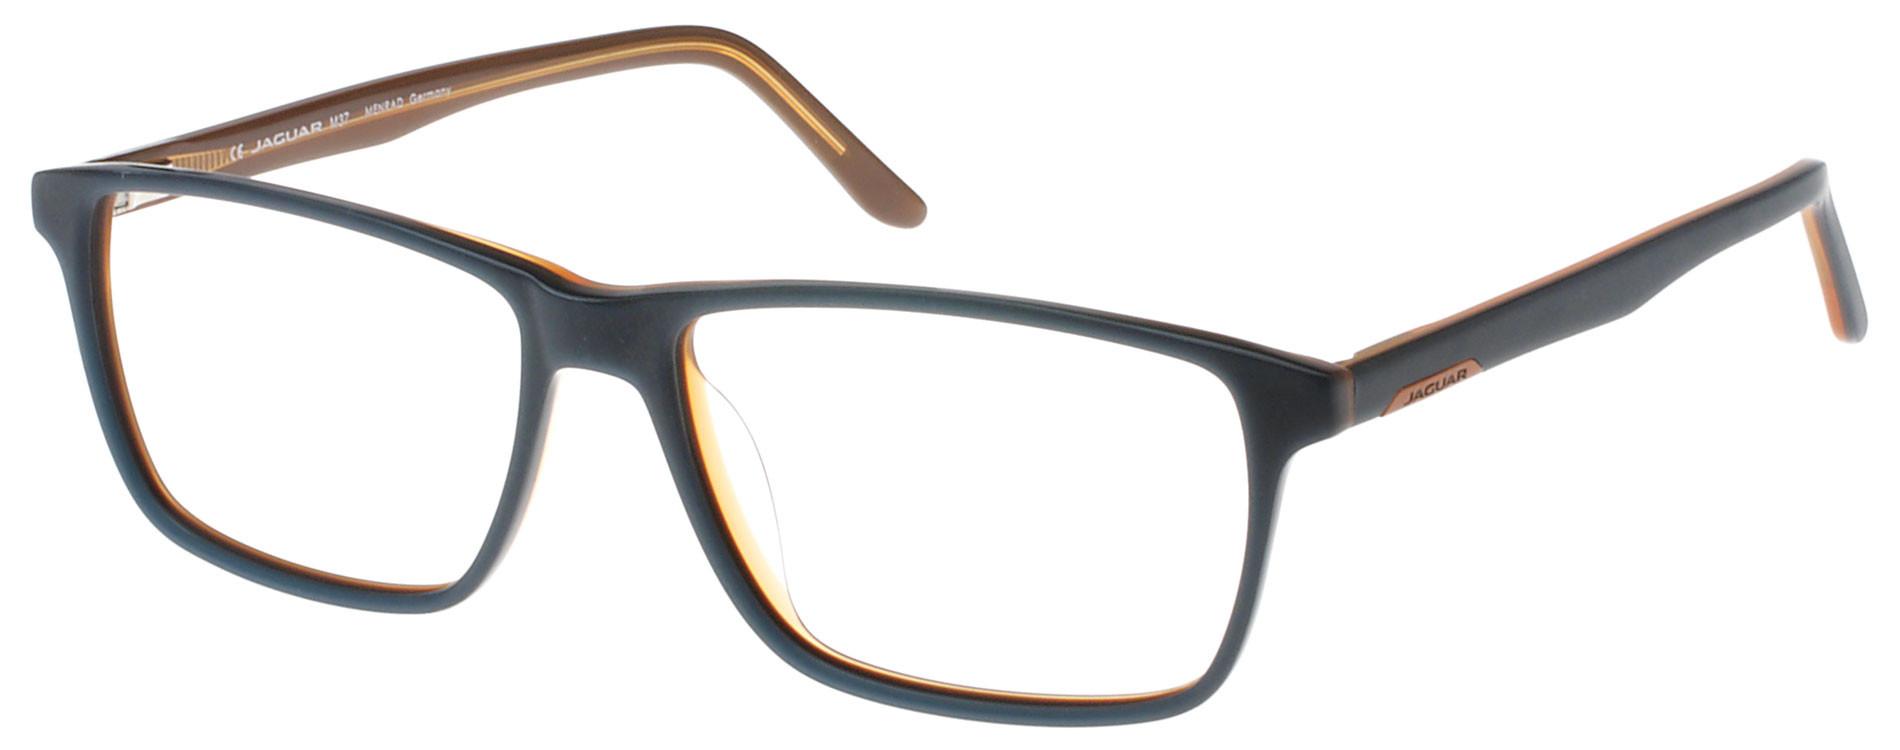 22f57ef3c12b Jaguar Spirit 31508 Progressive Prescription Eyeglasses FREE S H  JG315084150PR